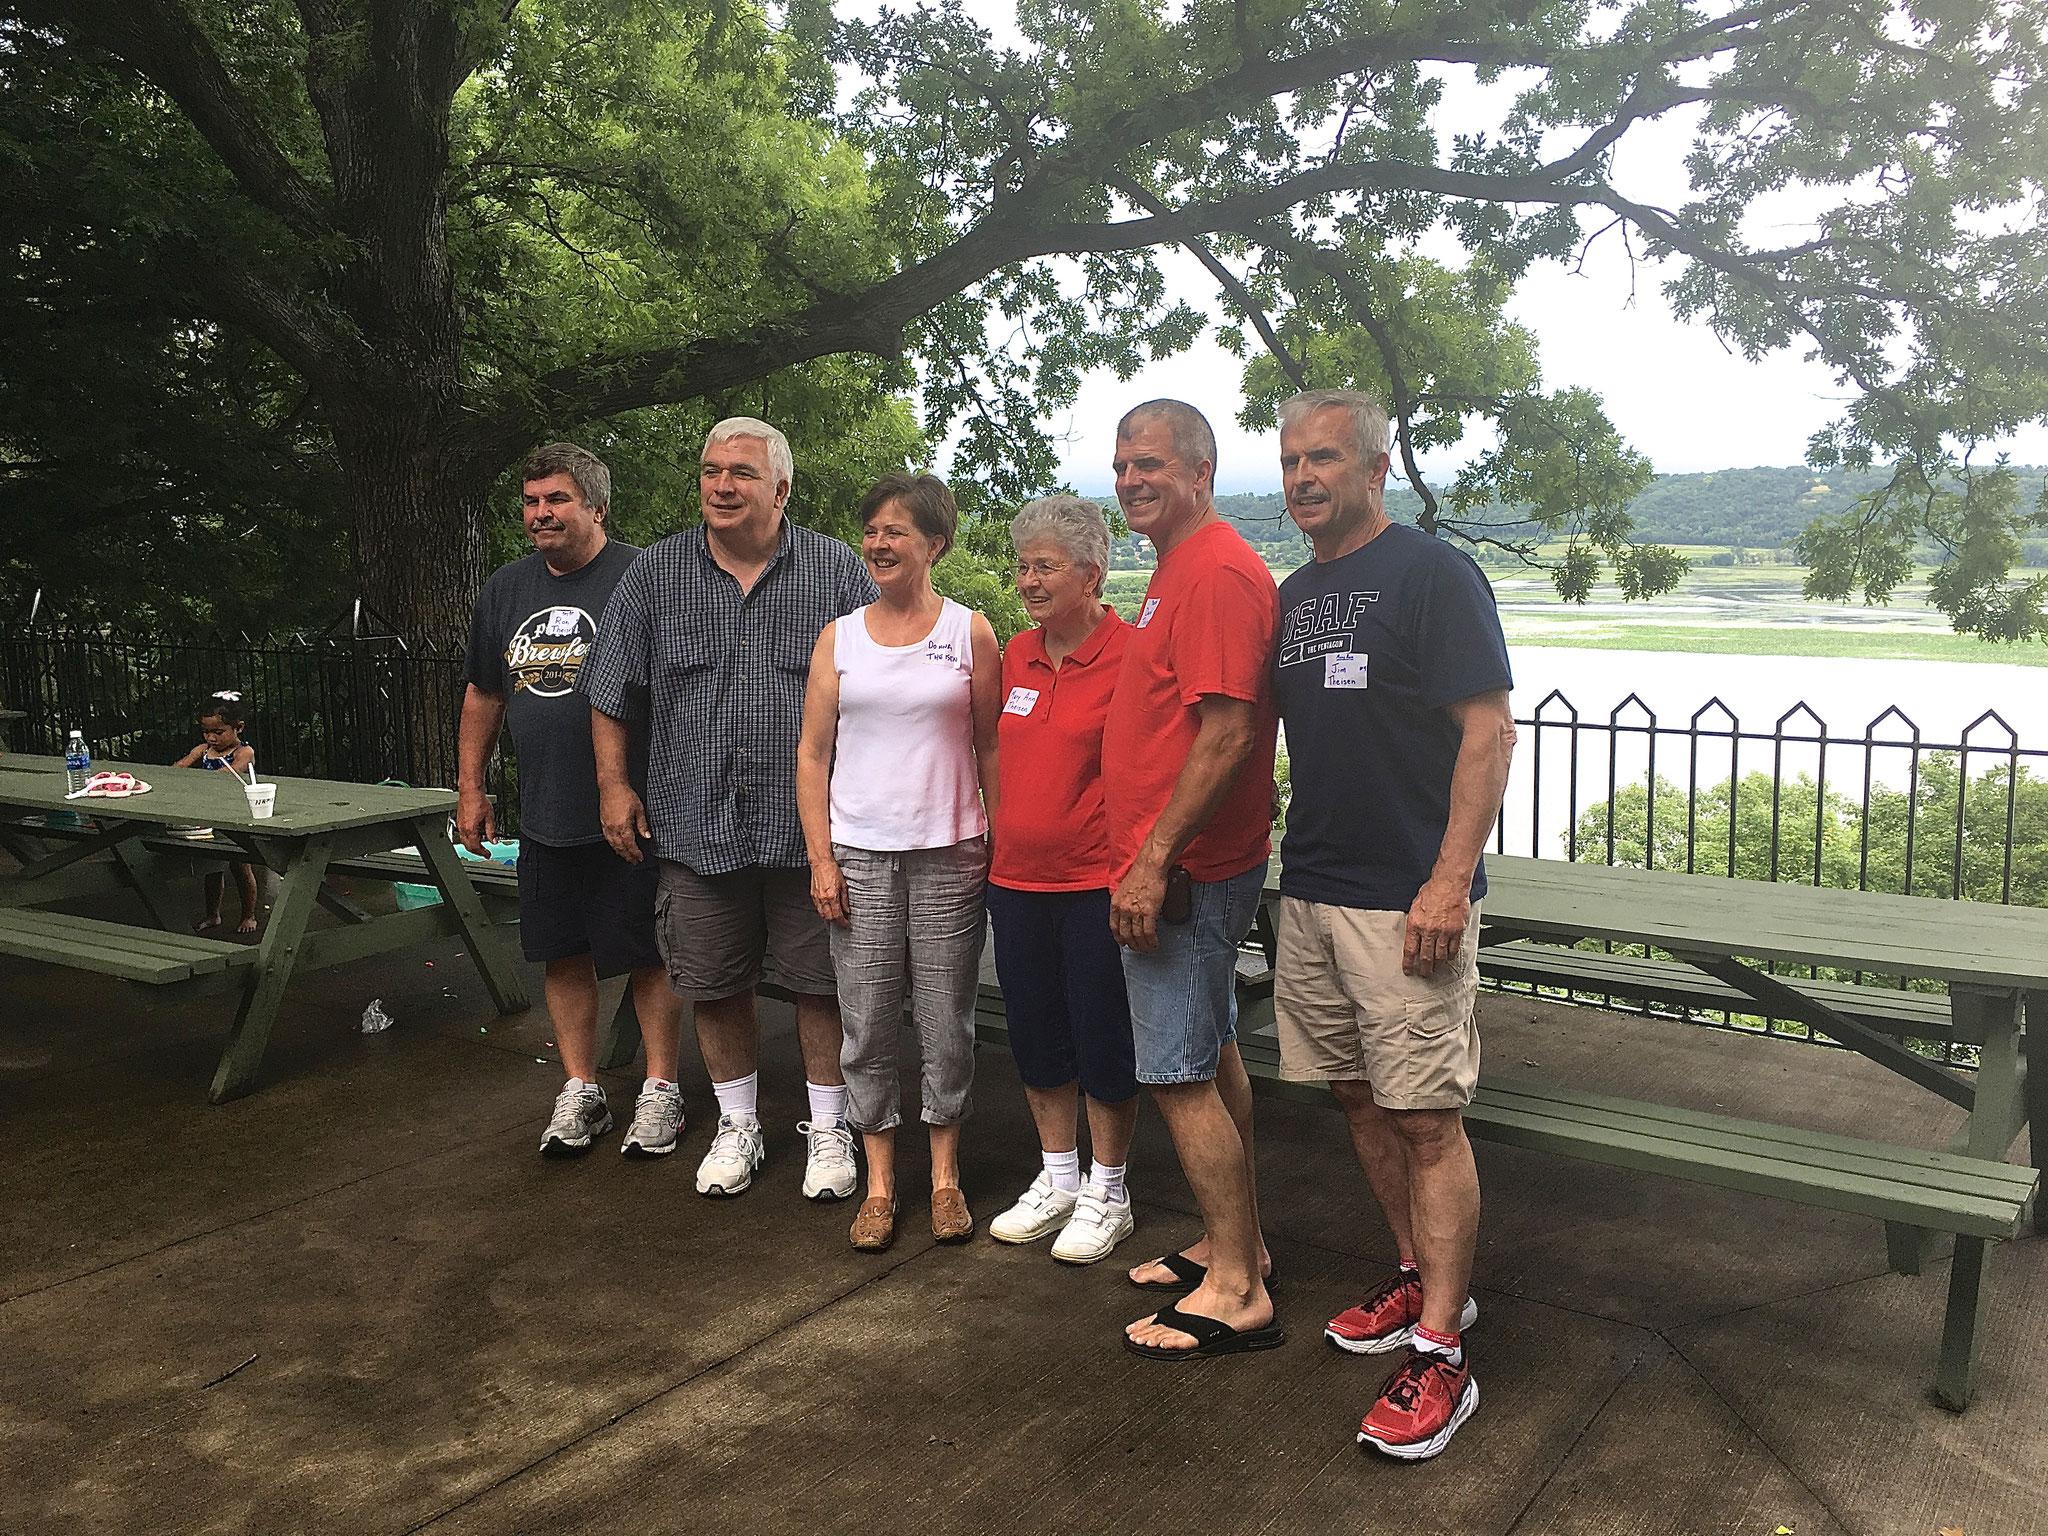 Ron, Steve, Donna, Mary Ann, Dave, and Jim Theisen